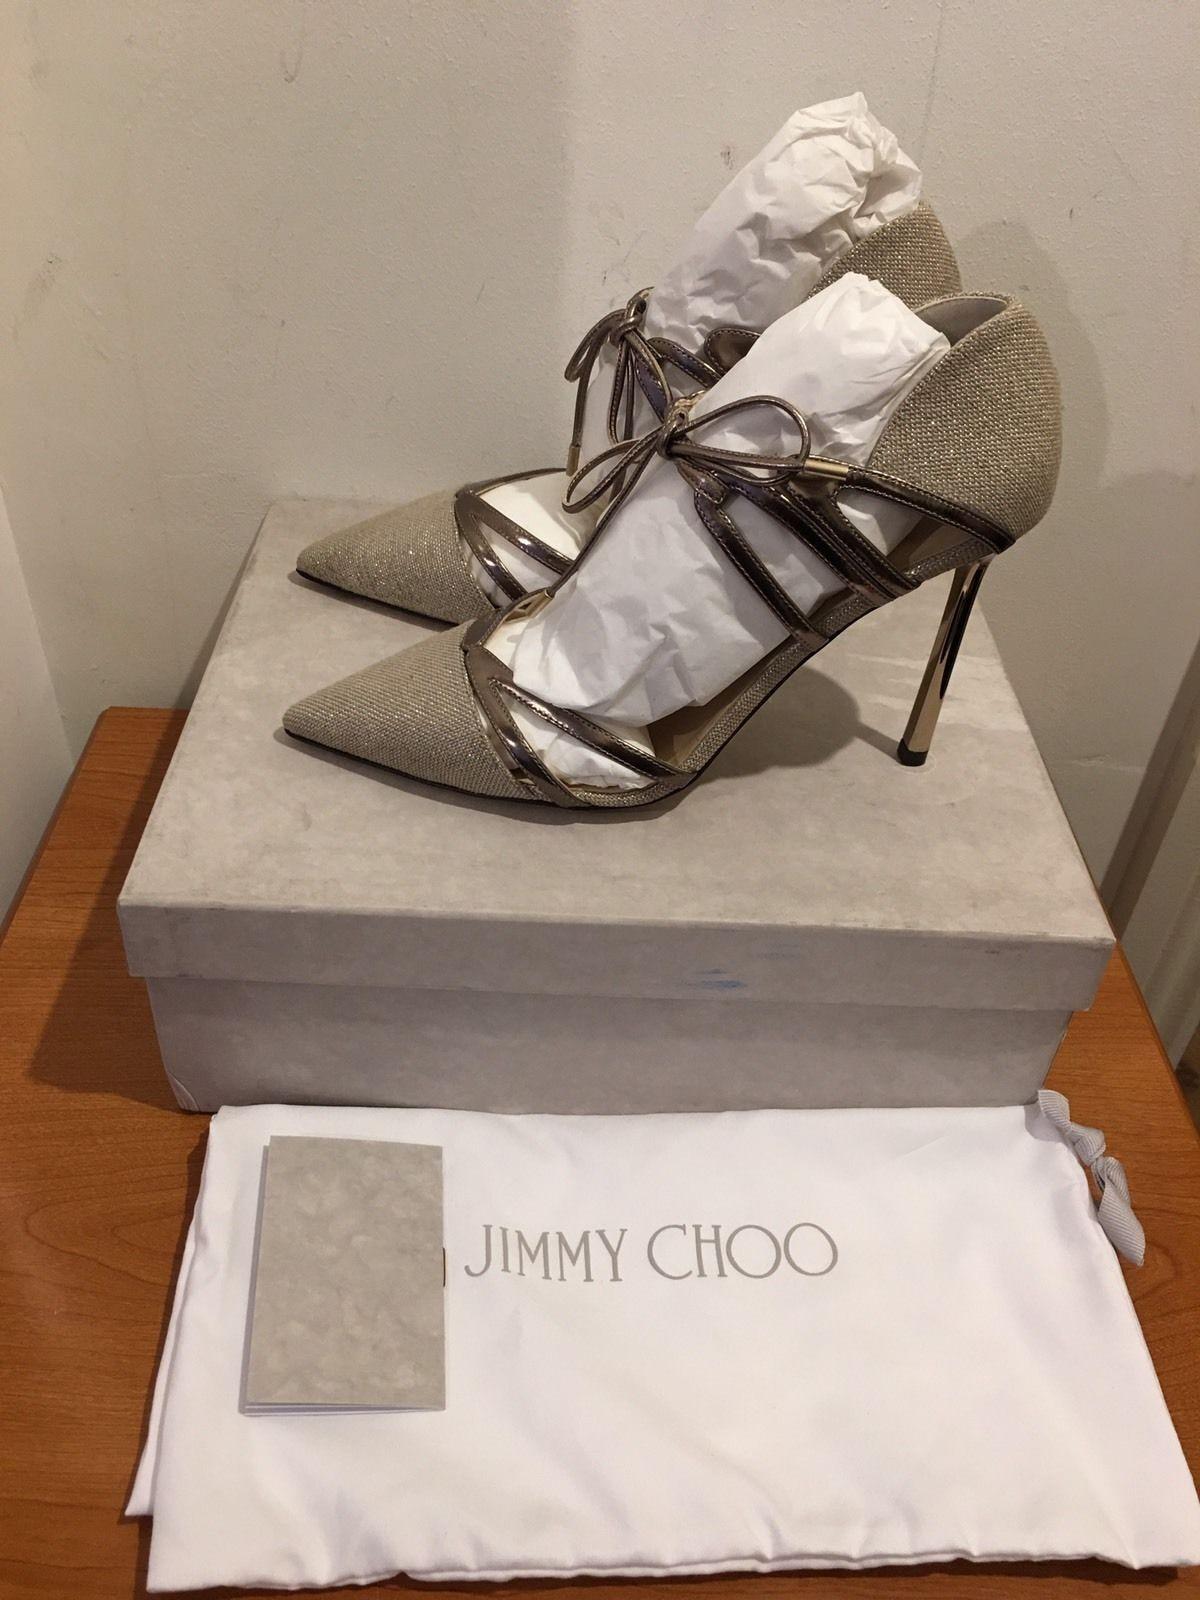 JIMMY CHOO Hime Cutout Elaphe Heels Pumps shoes